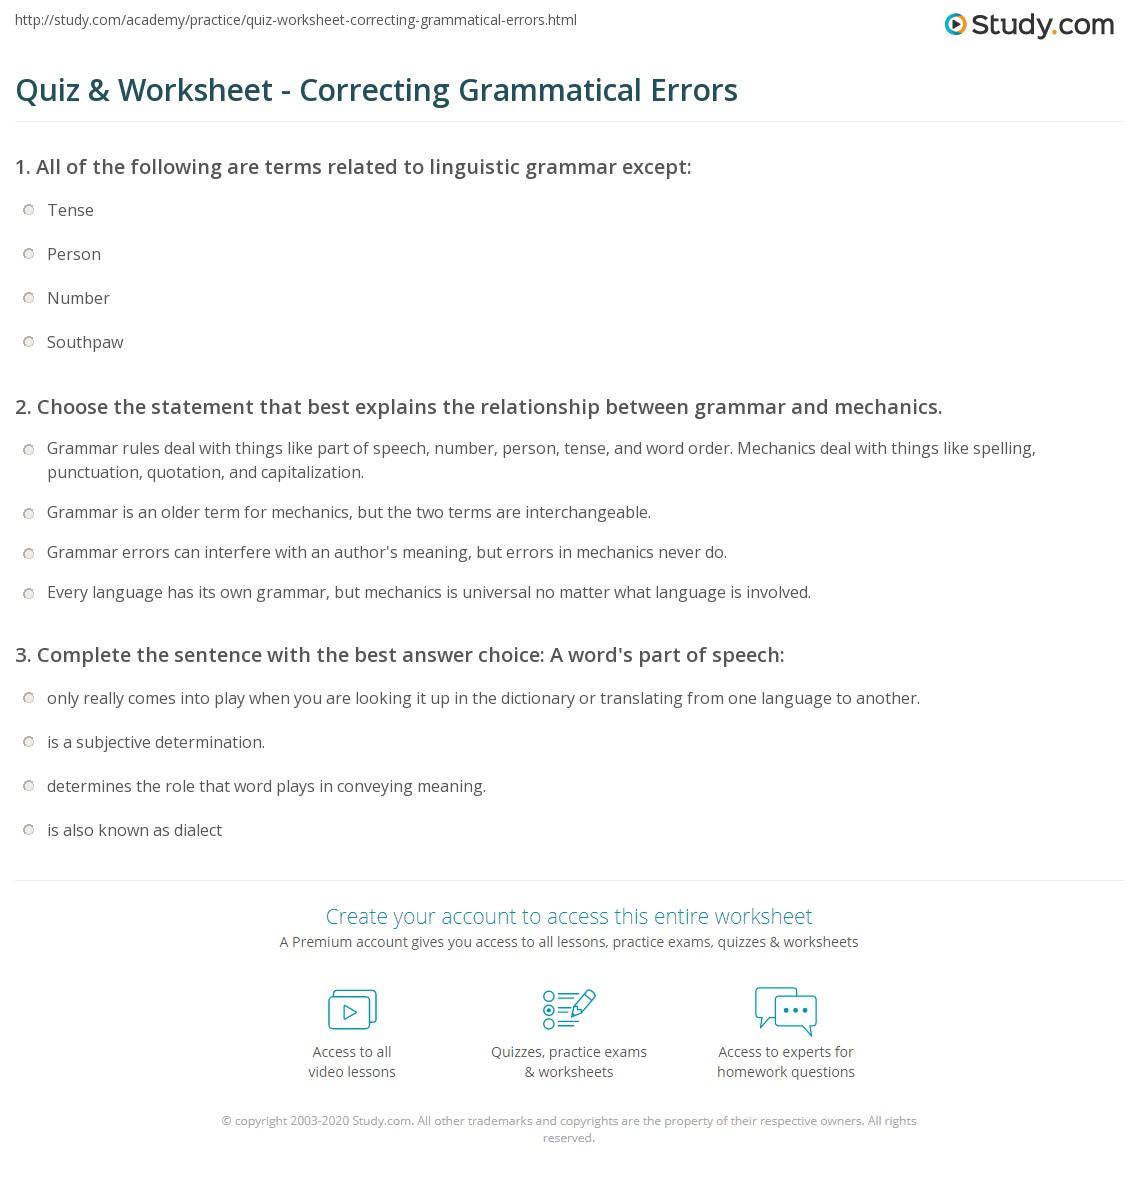 Worksheet Grammar Correction Worksheets Grass Fedjp Worksheet Study Site